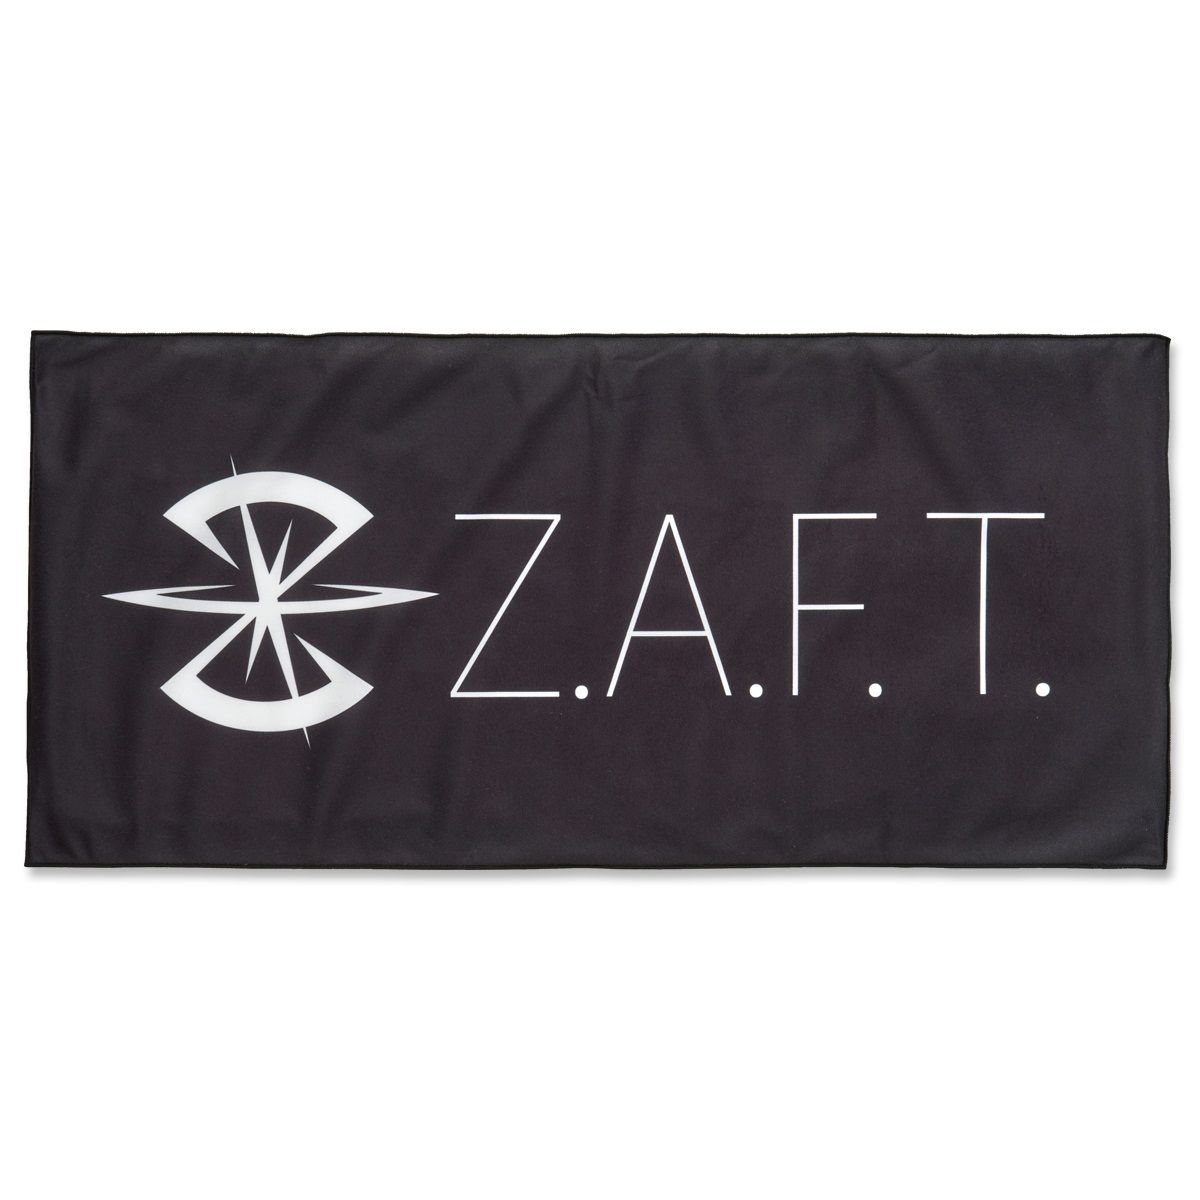 Mobile Suit Gundam SEED ZAFT Emblem Face Towel